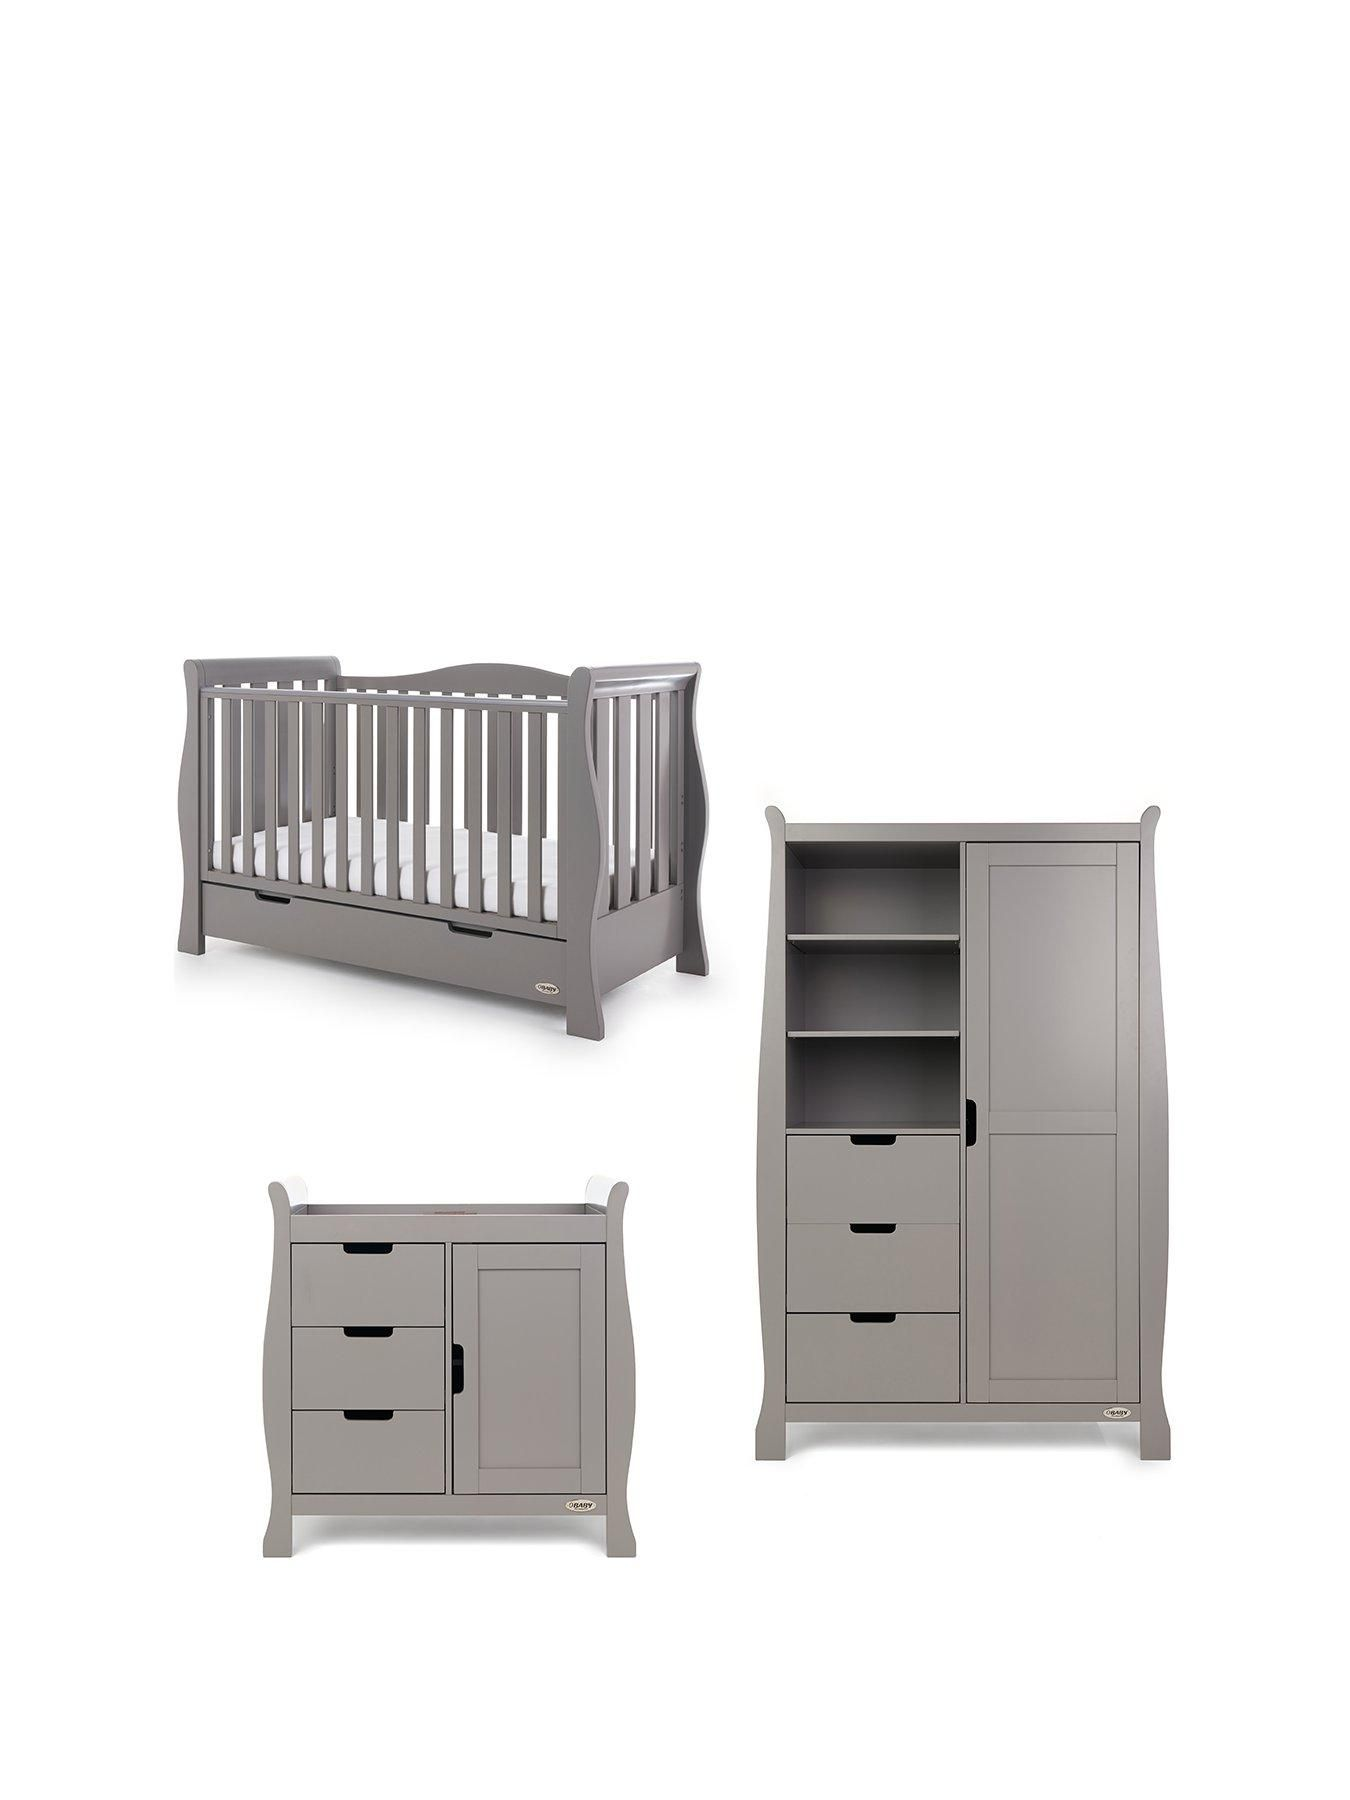 Stamford Luxe Sleigh 3 Piece Nursery Furniture Set Nursery